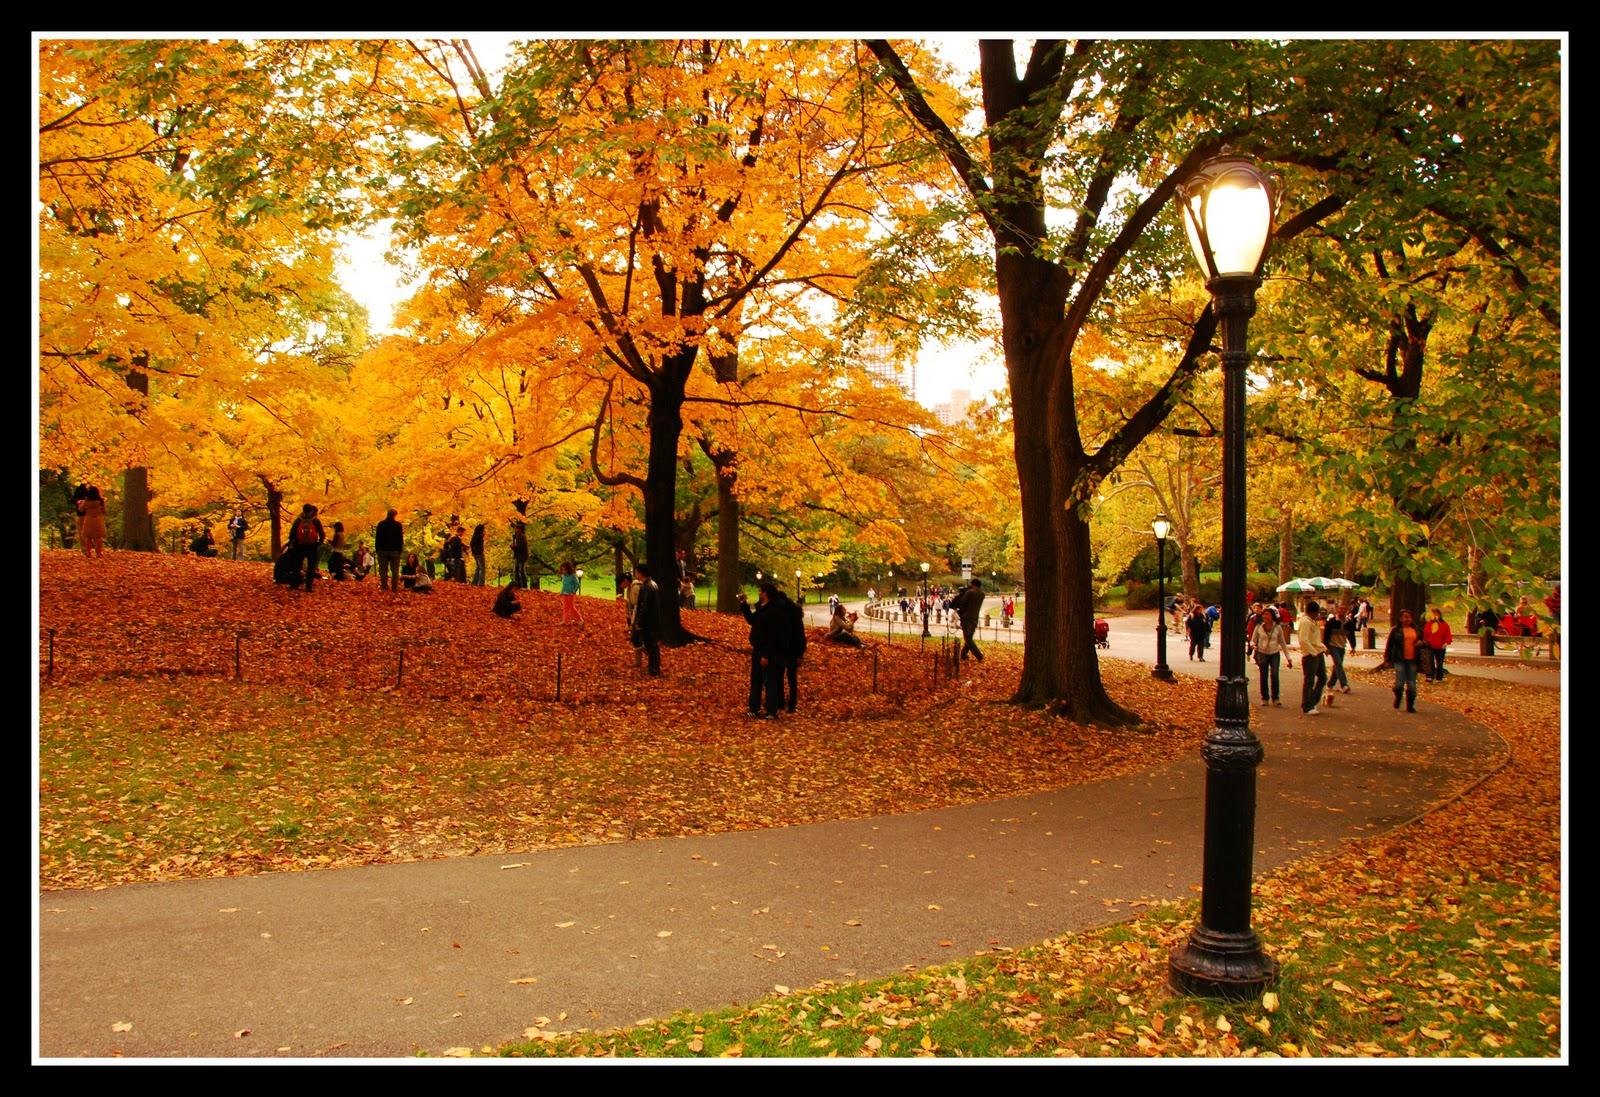 Central Park Fall Wallpaper | 3132 views 785 downloads 2 ...  |Autumn Central Park Screensavers